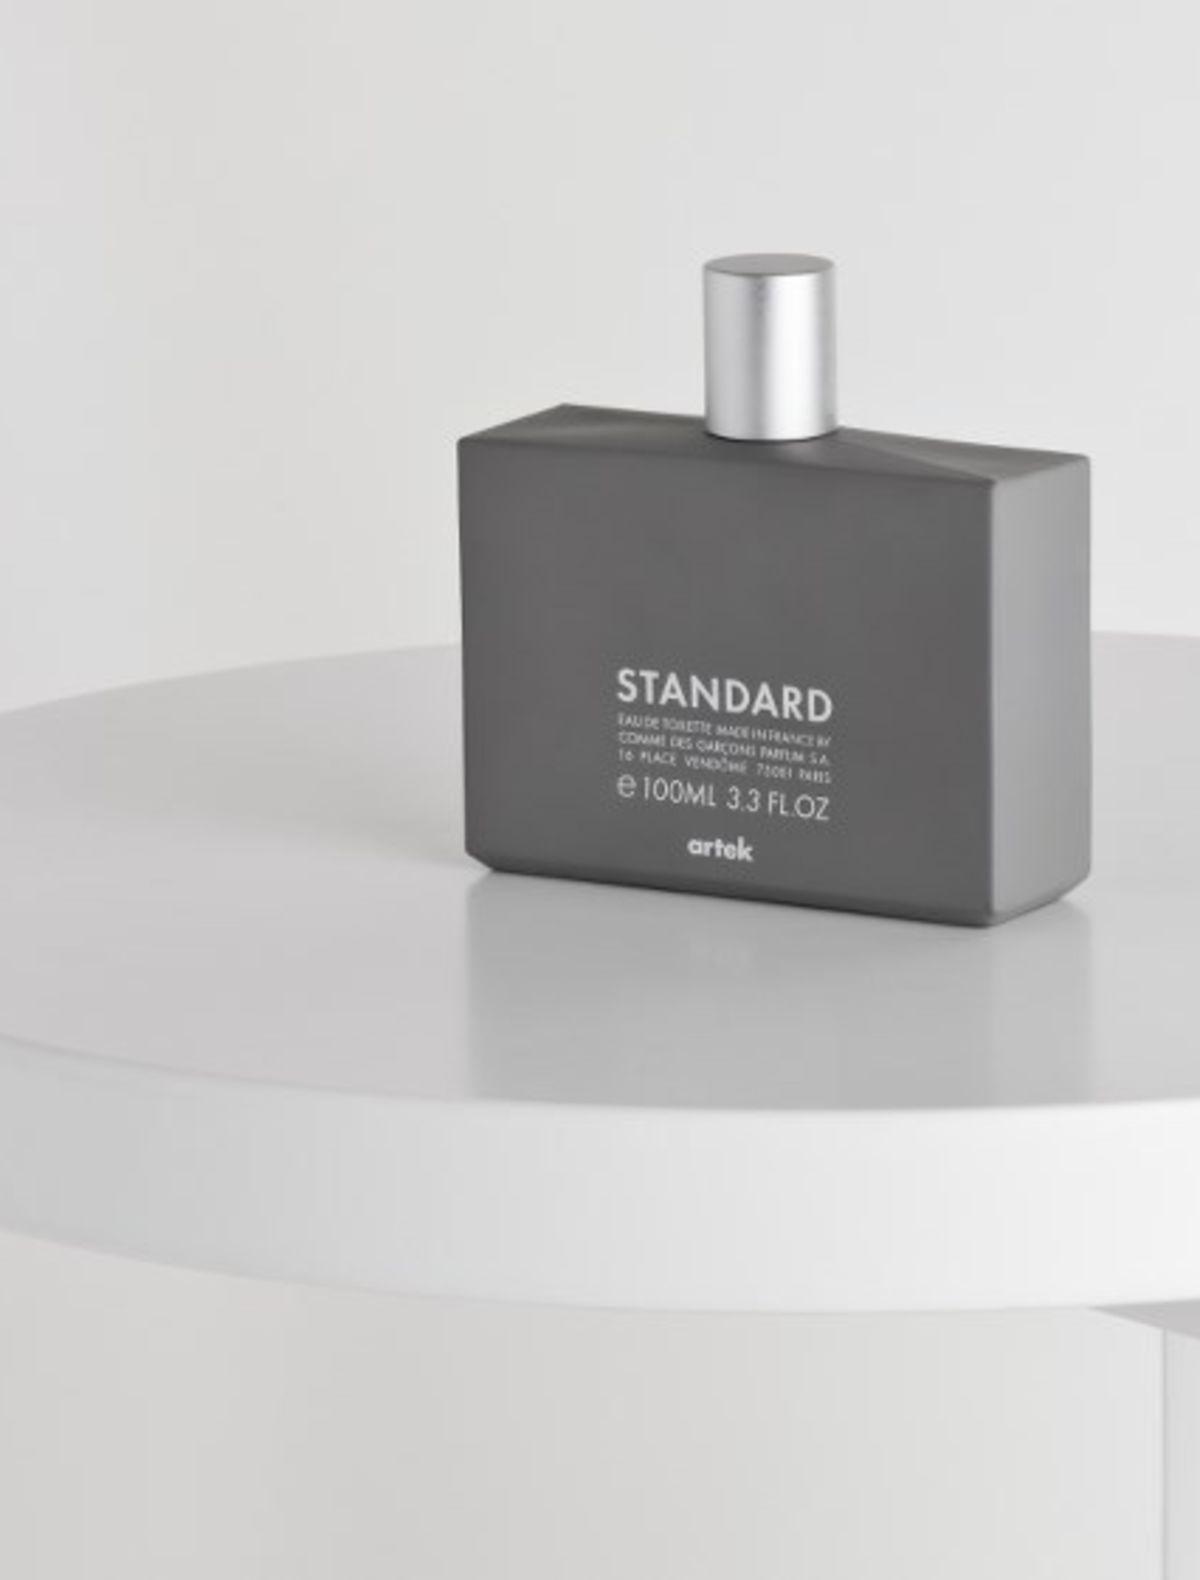 Artek_Standard_3_JPG